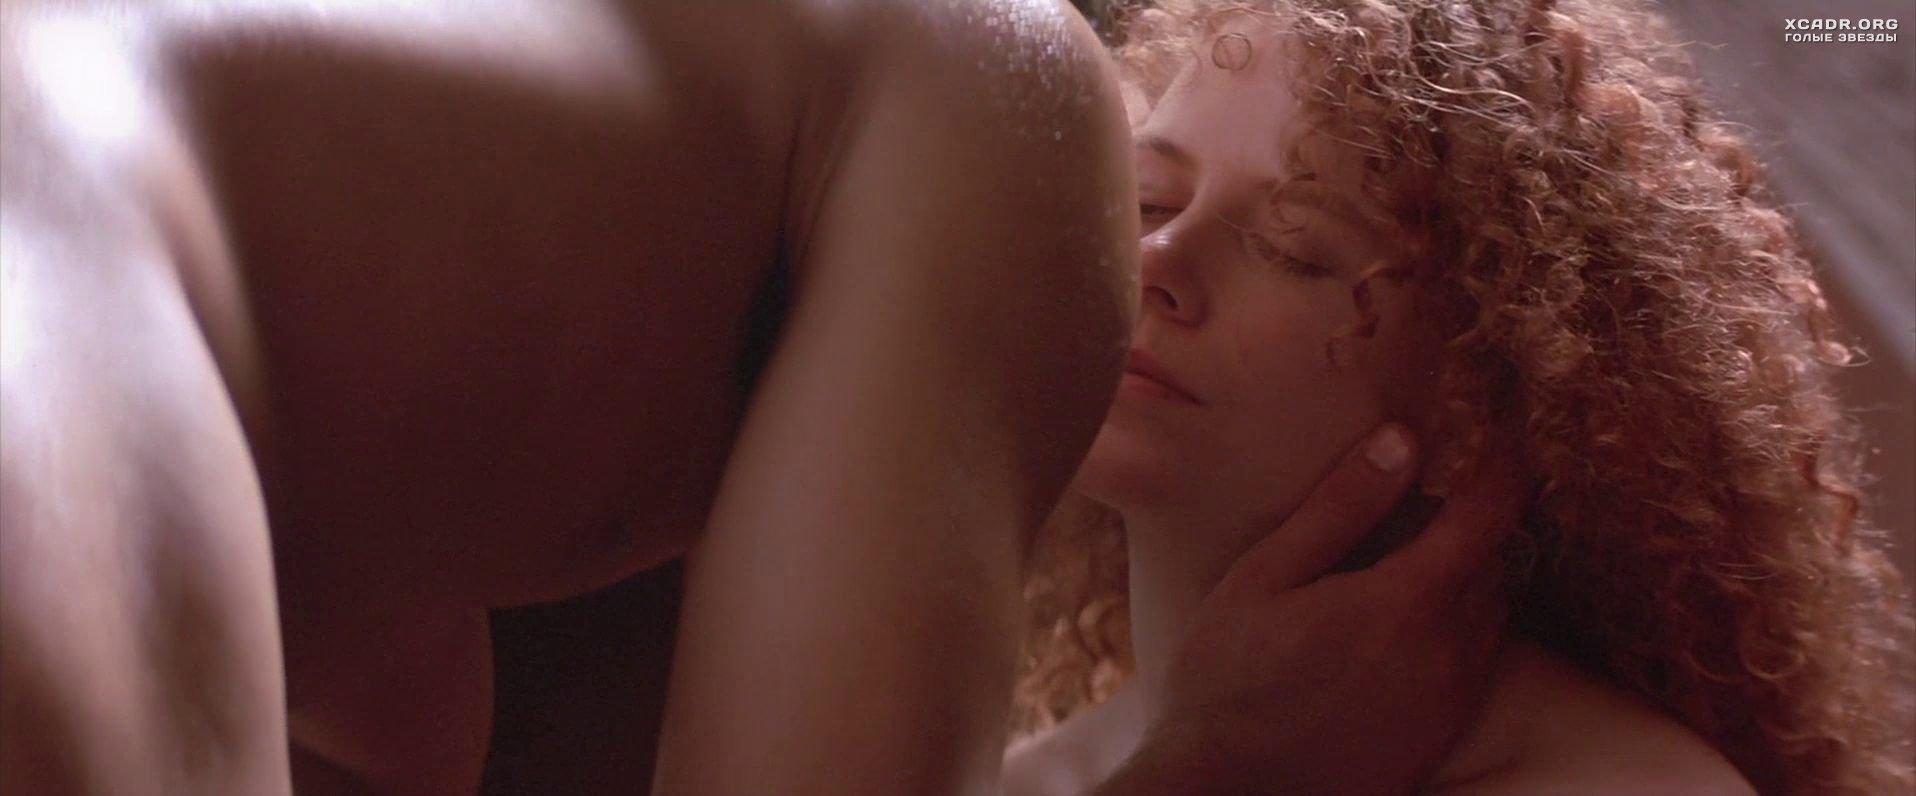 Фото николь кидман фильм эротика